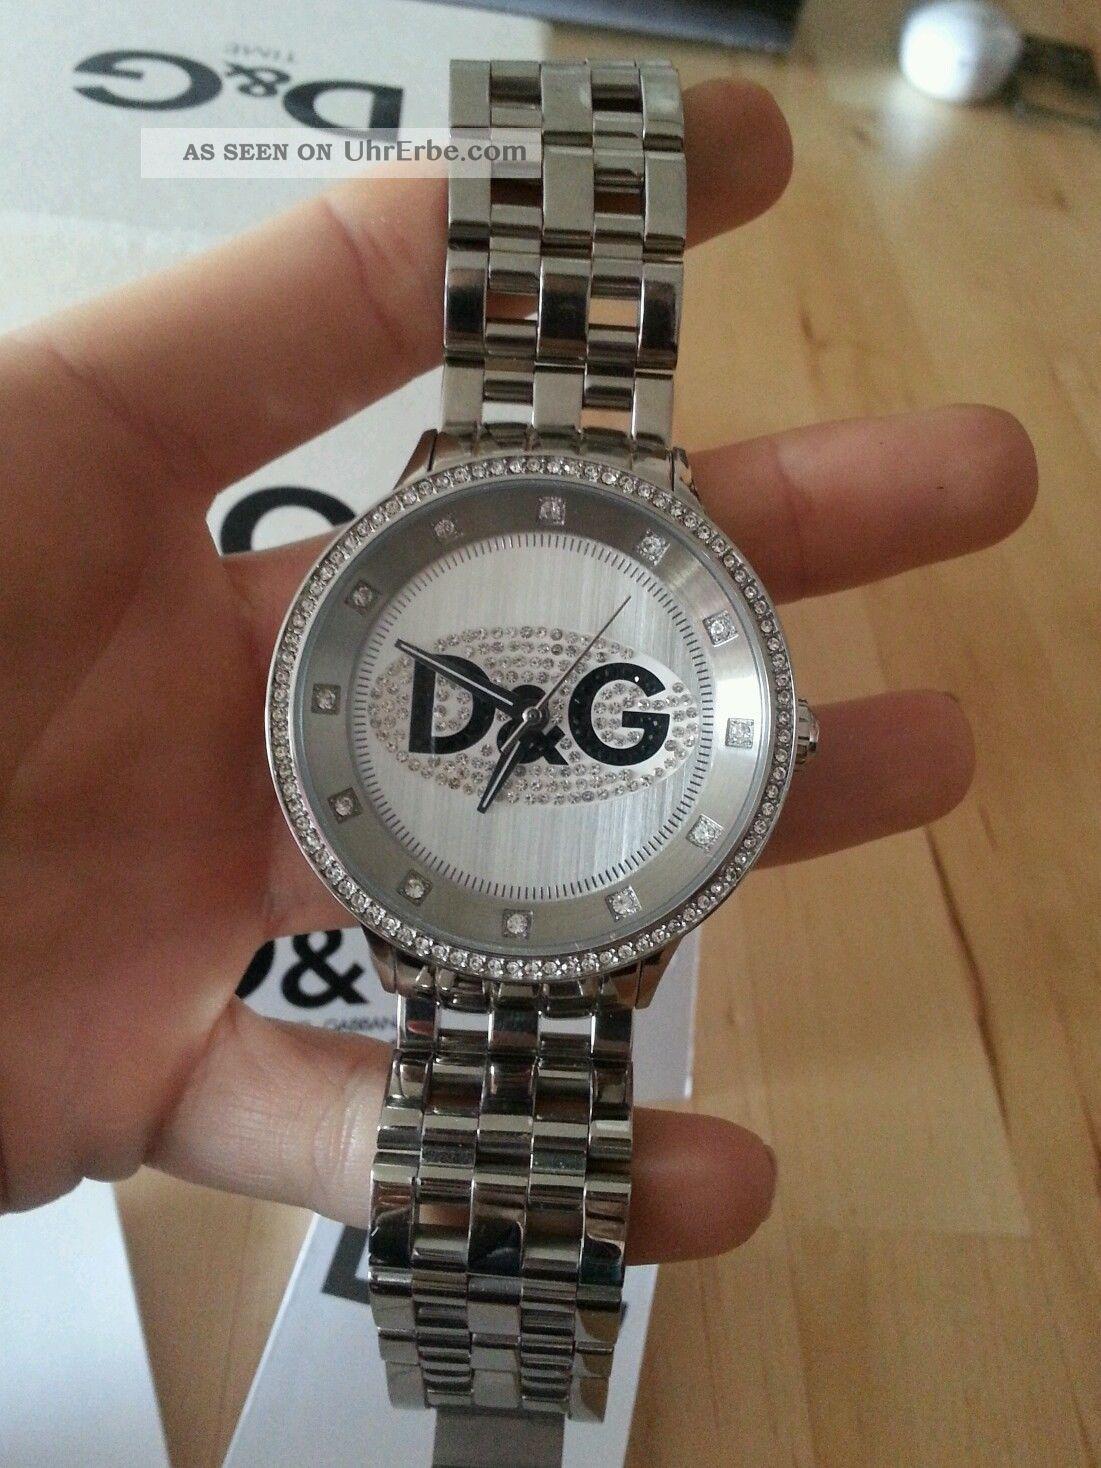 D&g Uhr Unisex Dw0131,  Swarovski Armbanduhren Bild